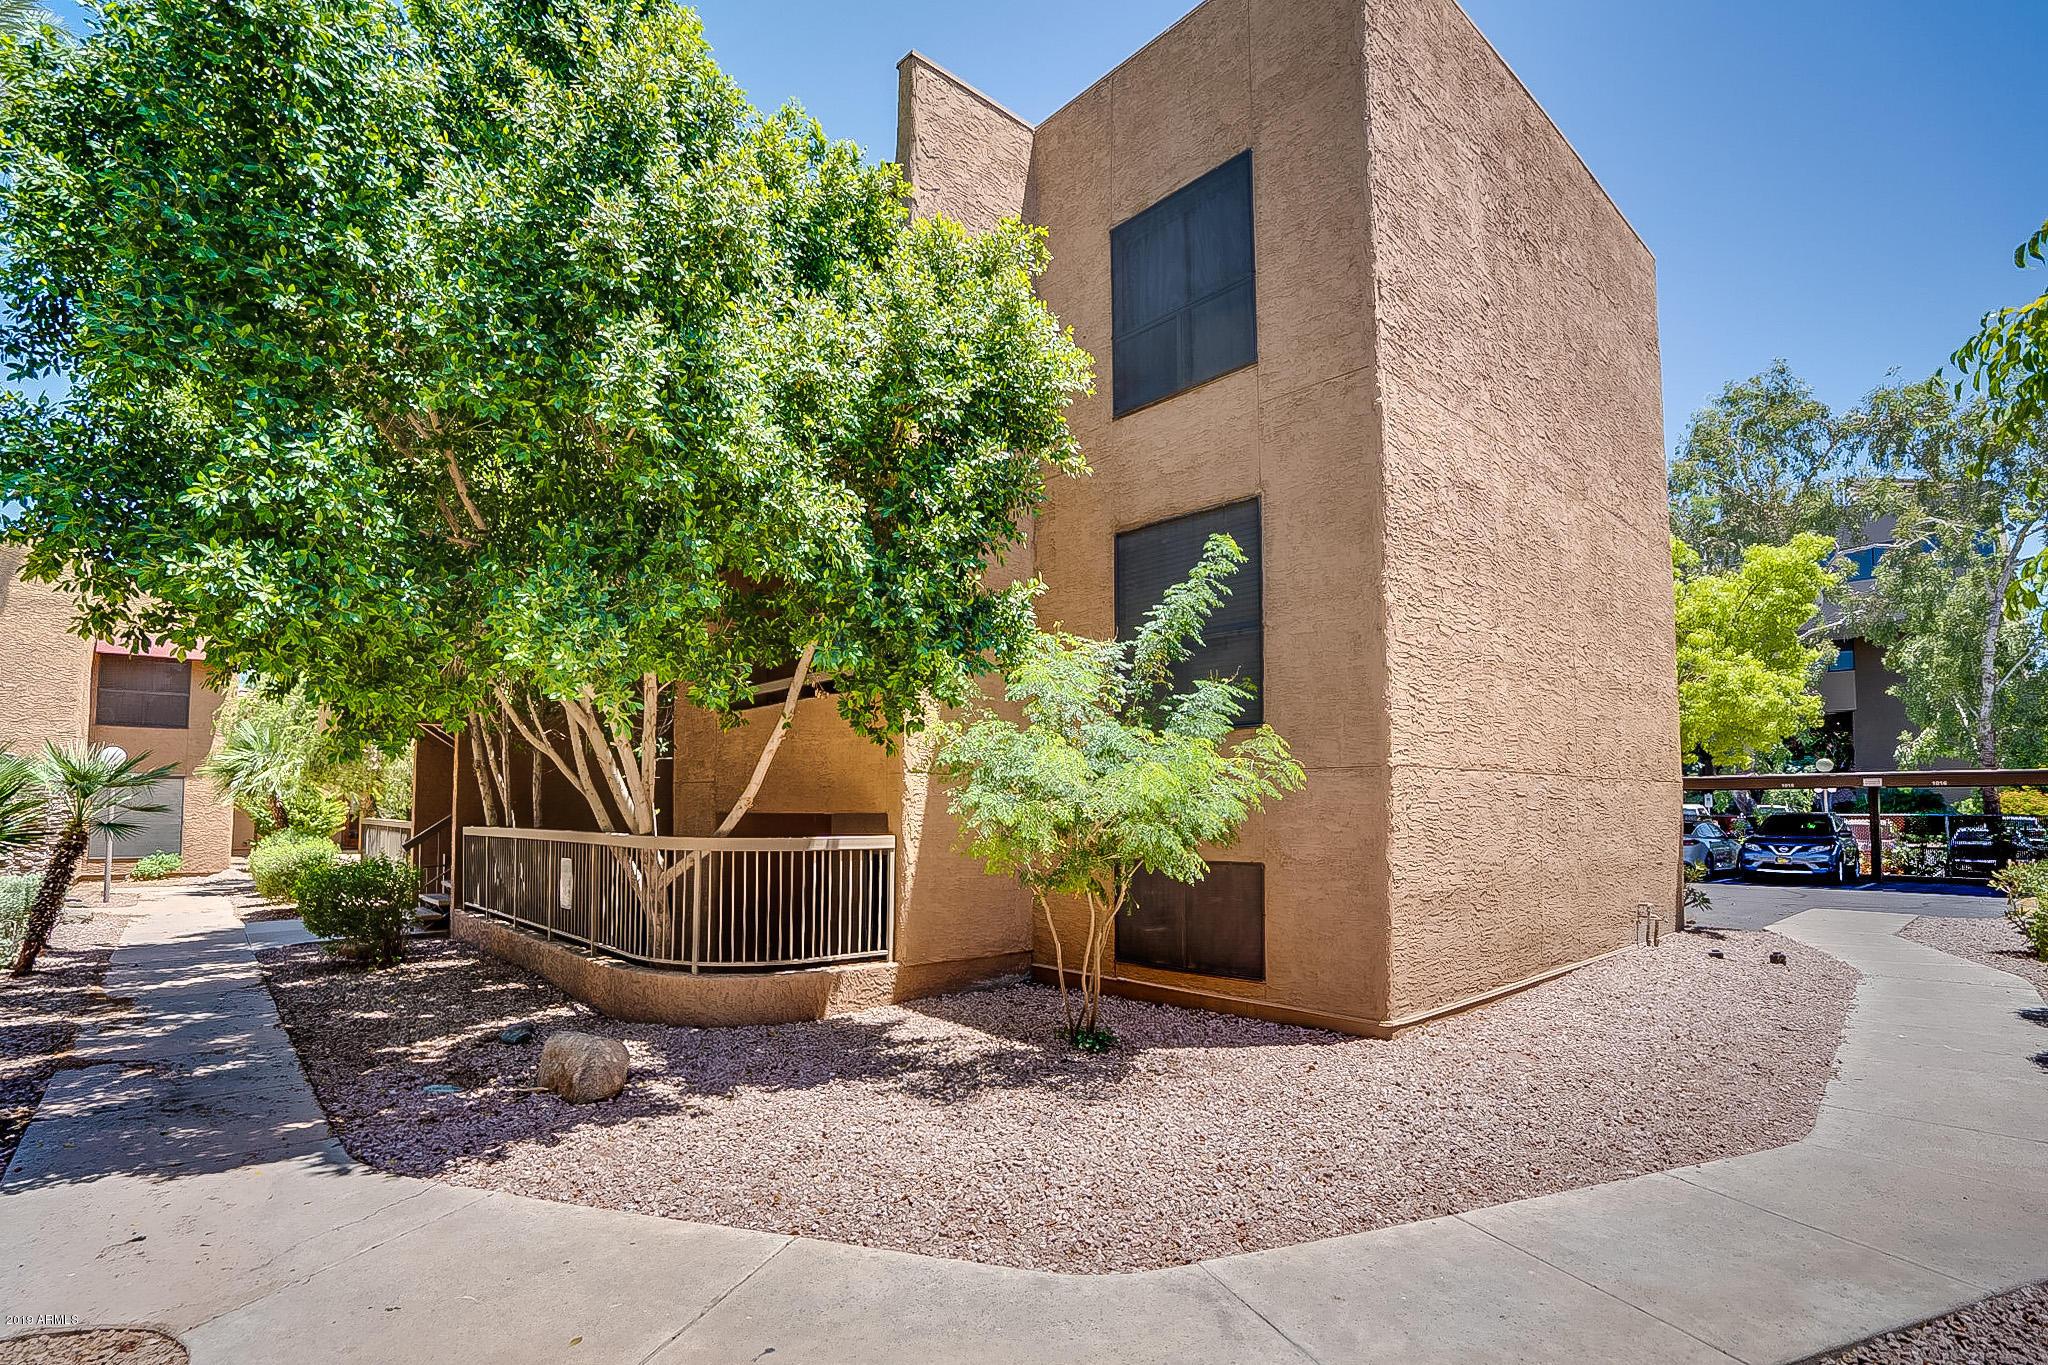 Photo of 2625 E INDIAN SCHOOL Road #105, Phoenix, AZ 85016